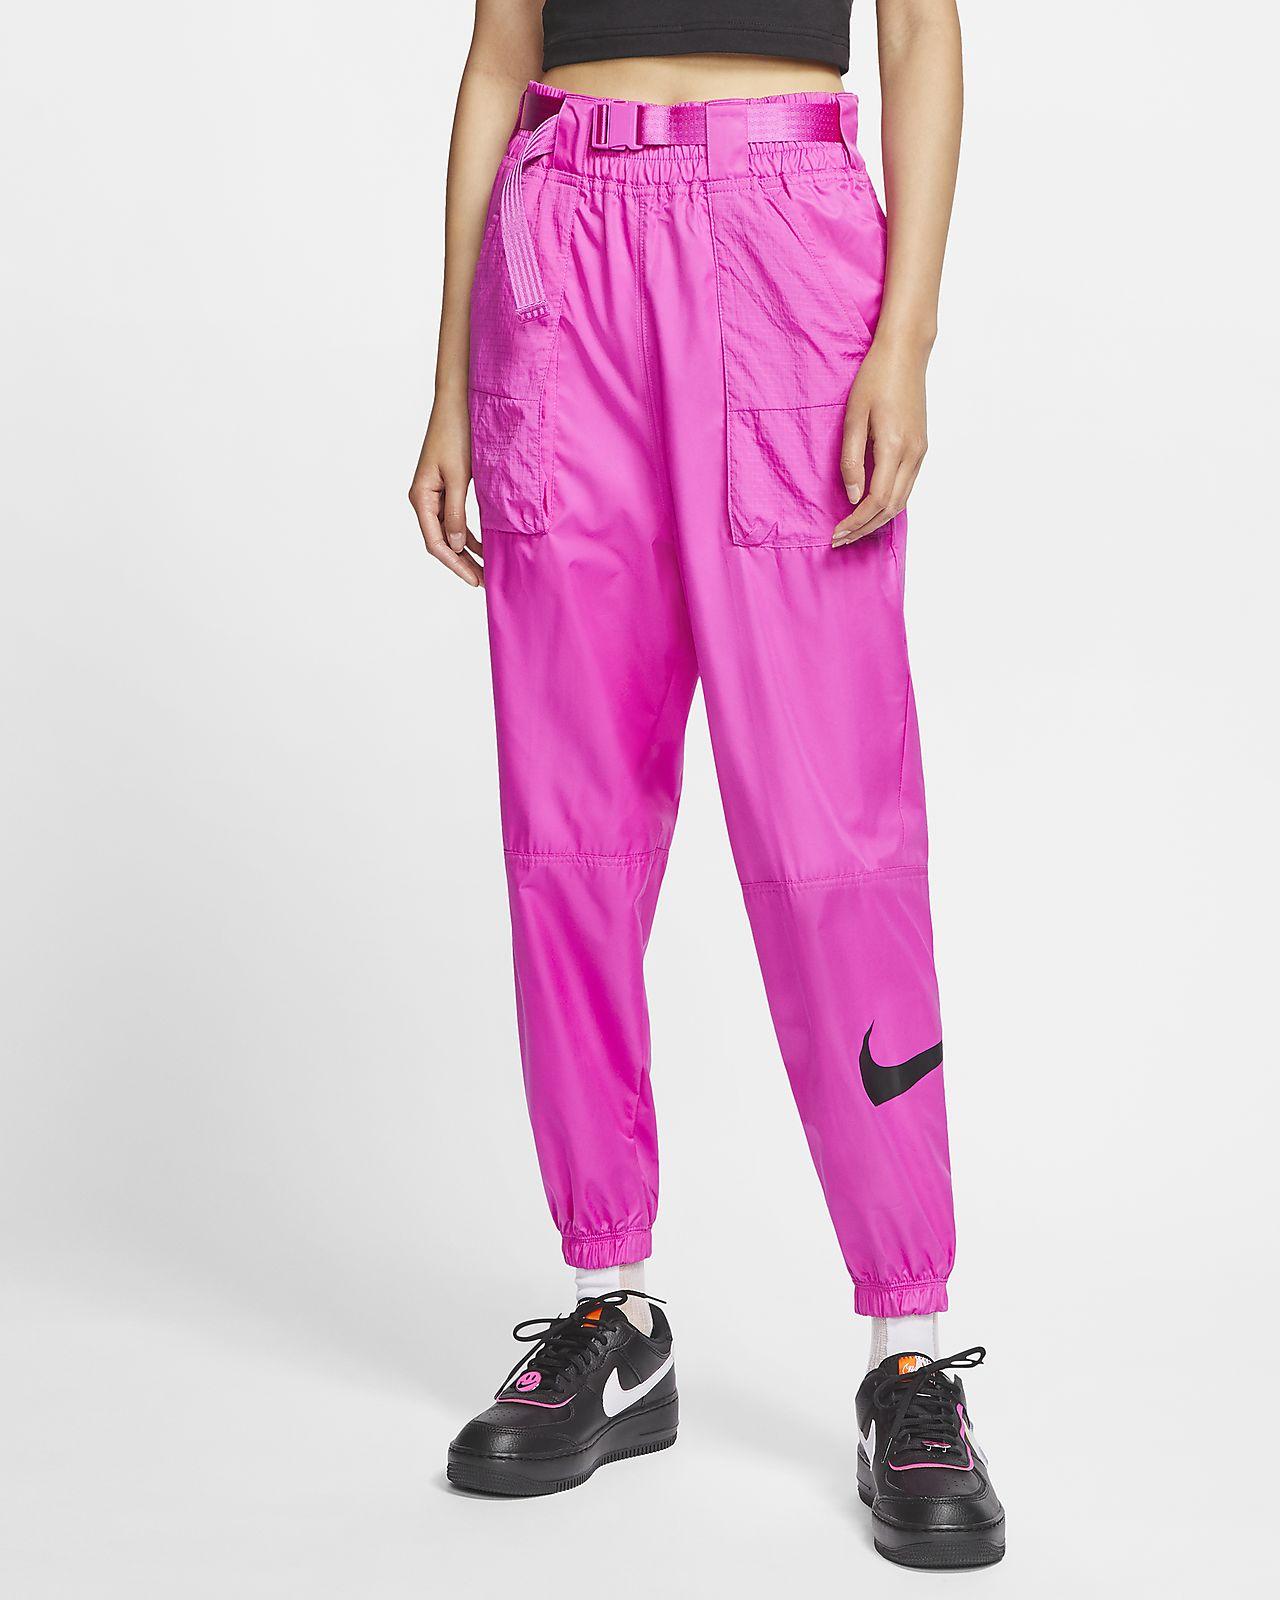 Nike Sportswear szőtt női Swoosh nadrág